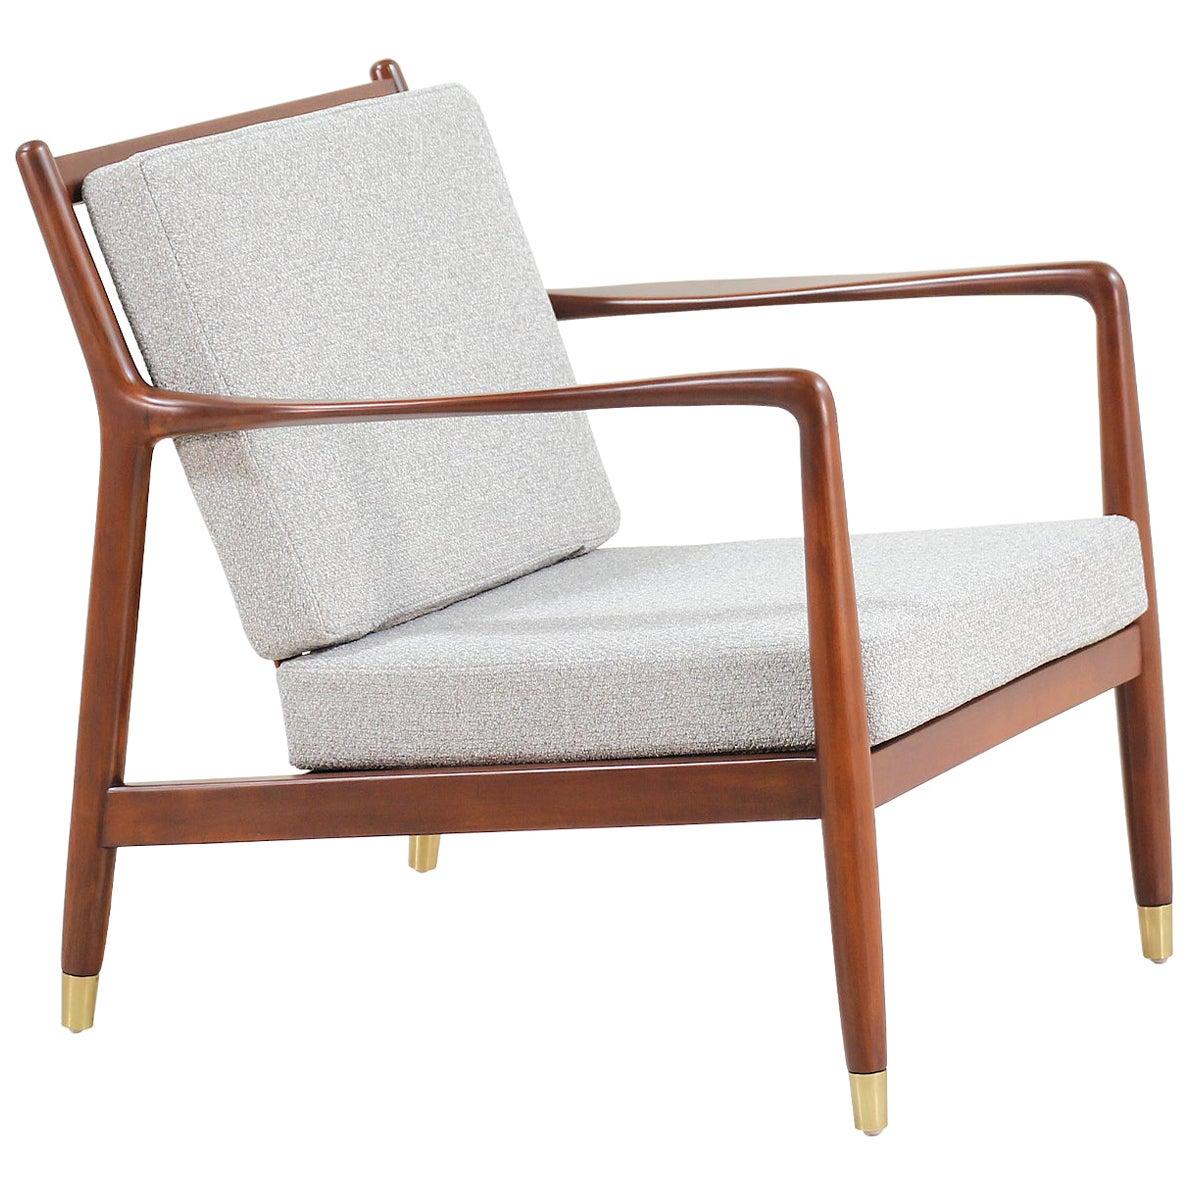 Folke Ohlsson Lounge Chair for DUX